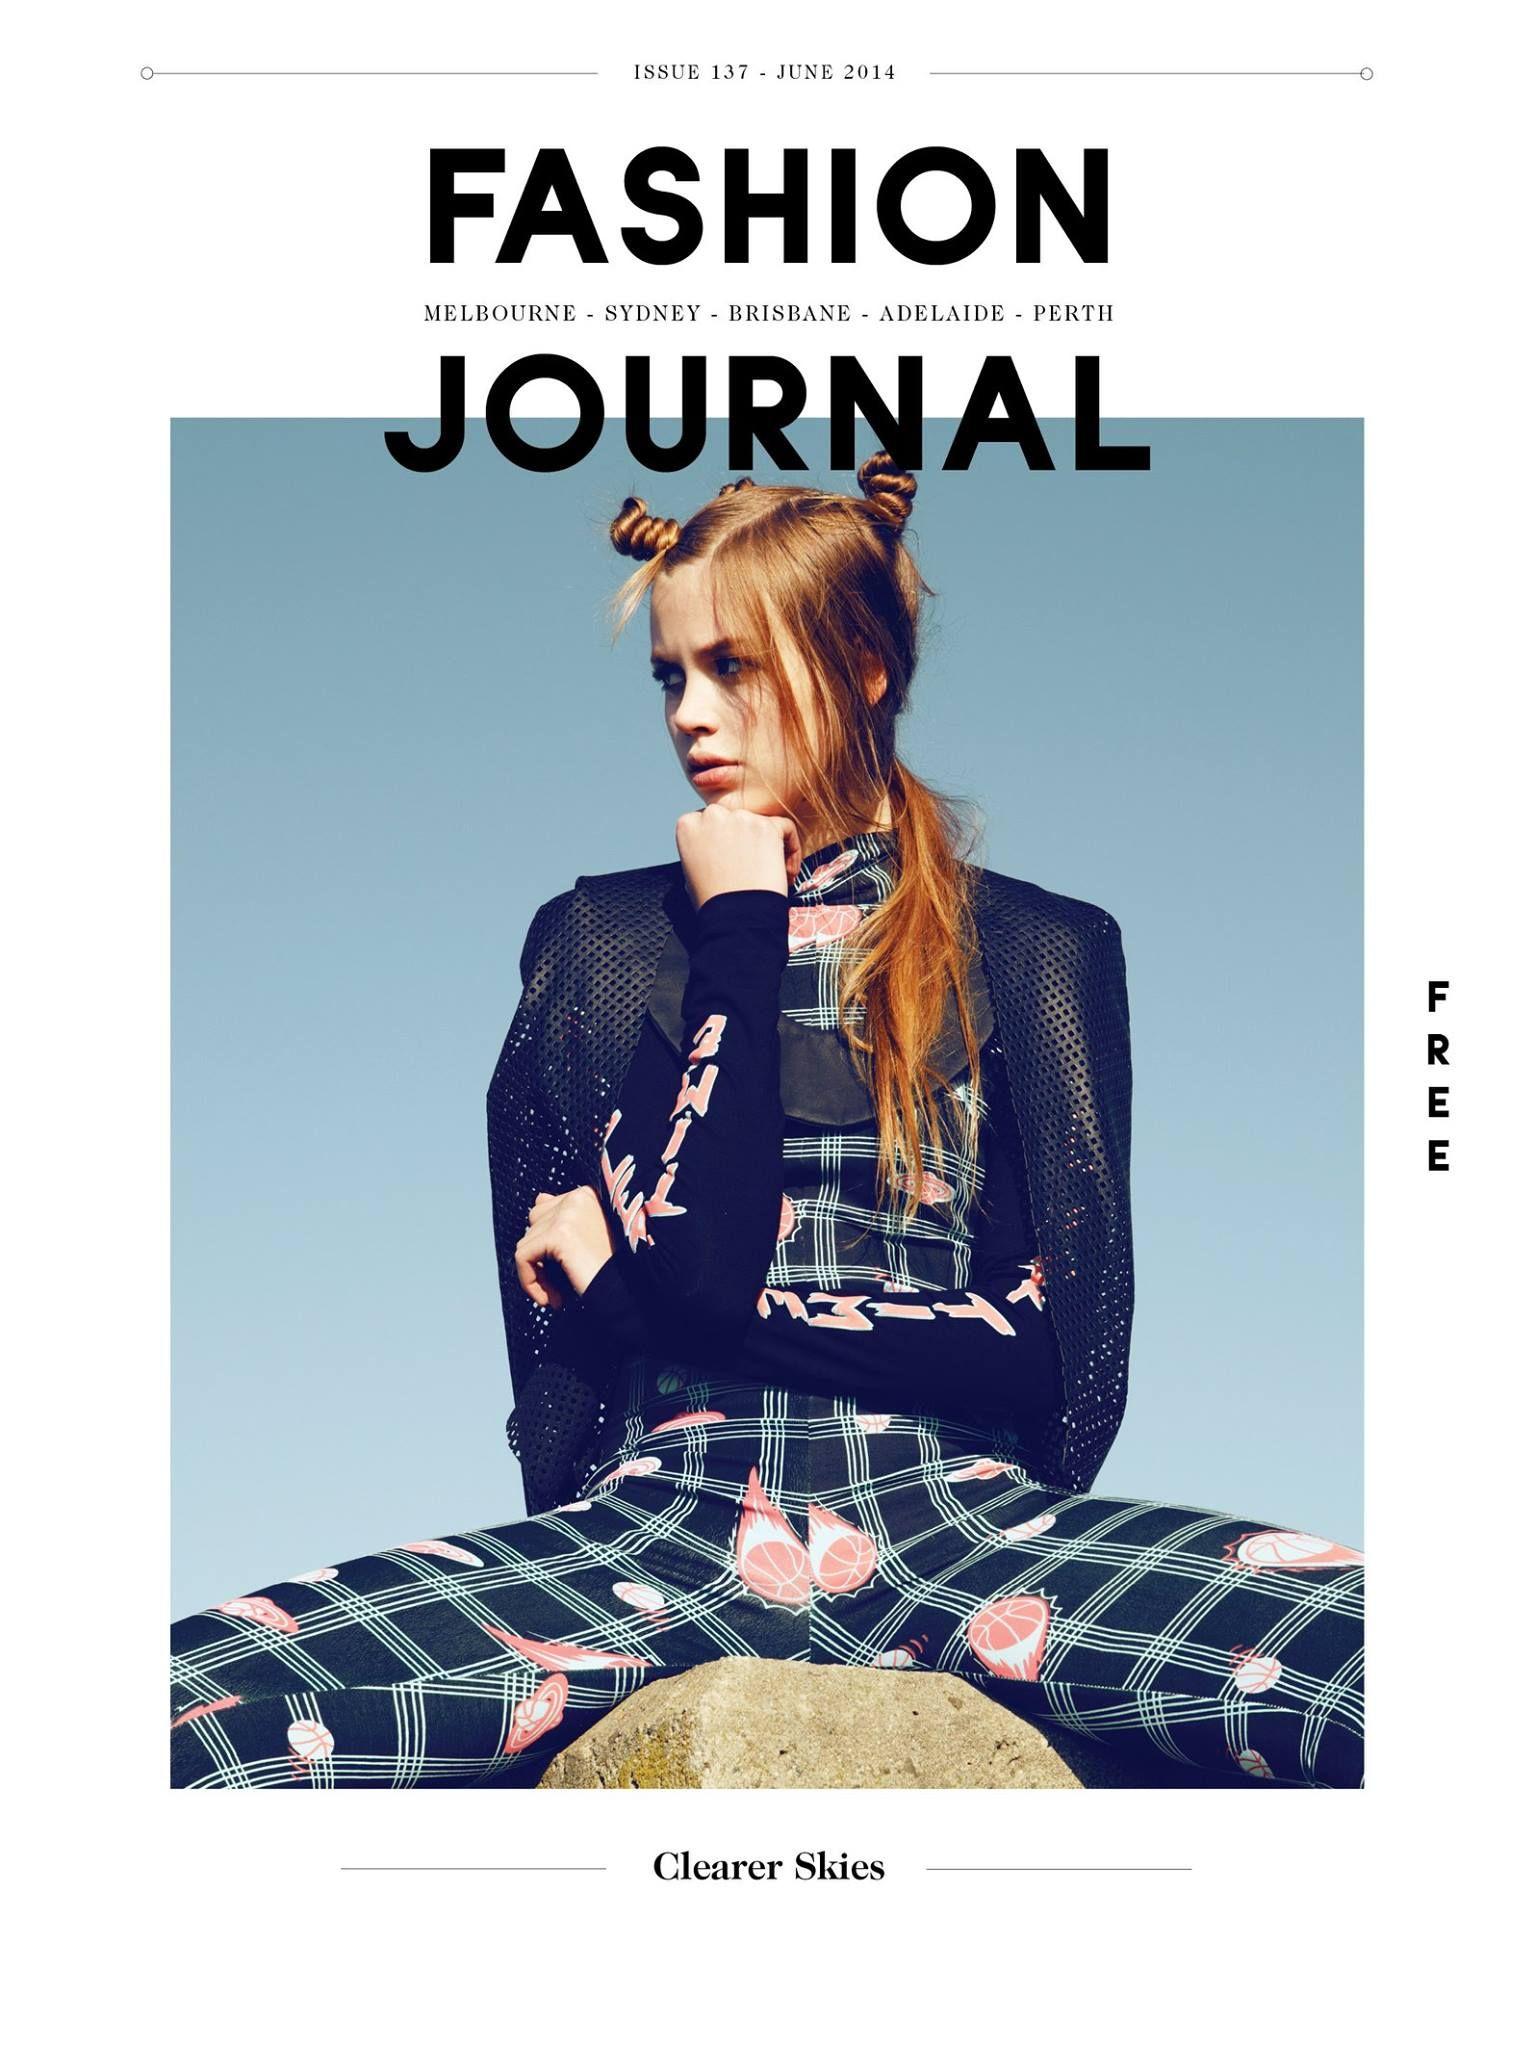 Fashion Journal エディトリアルデザイン 写真 文字 デザイン